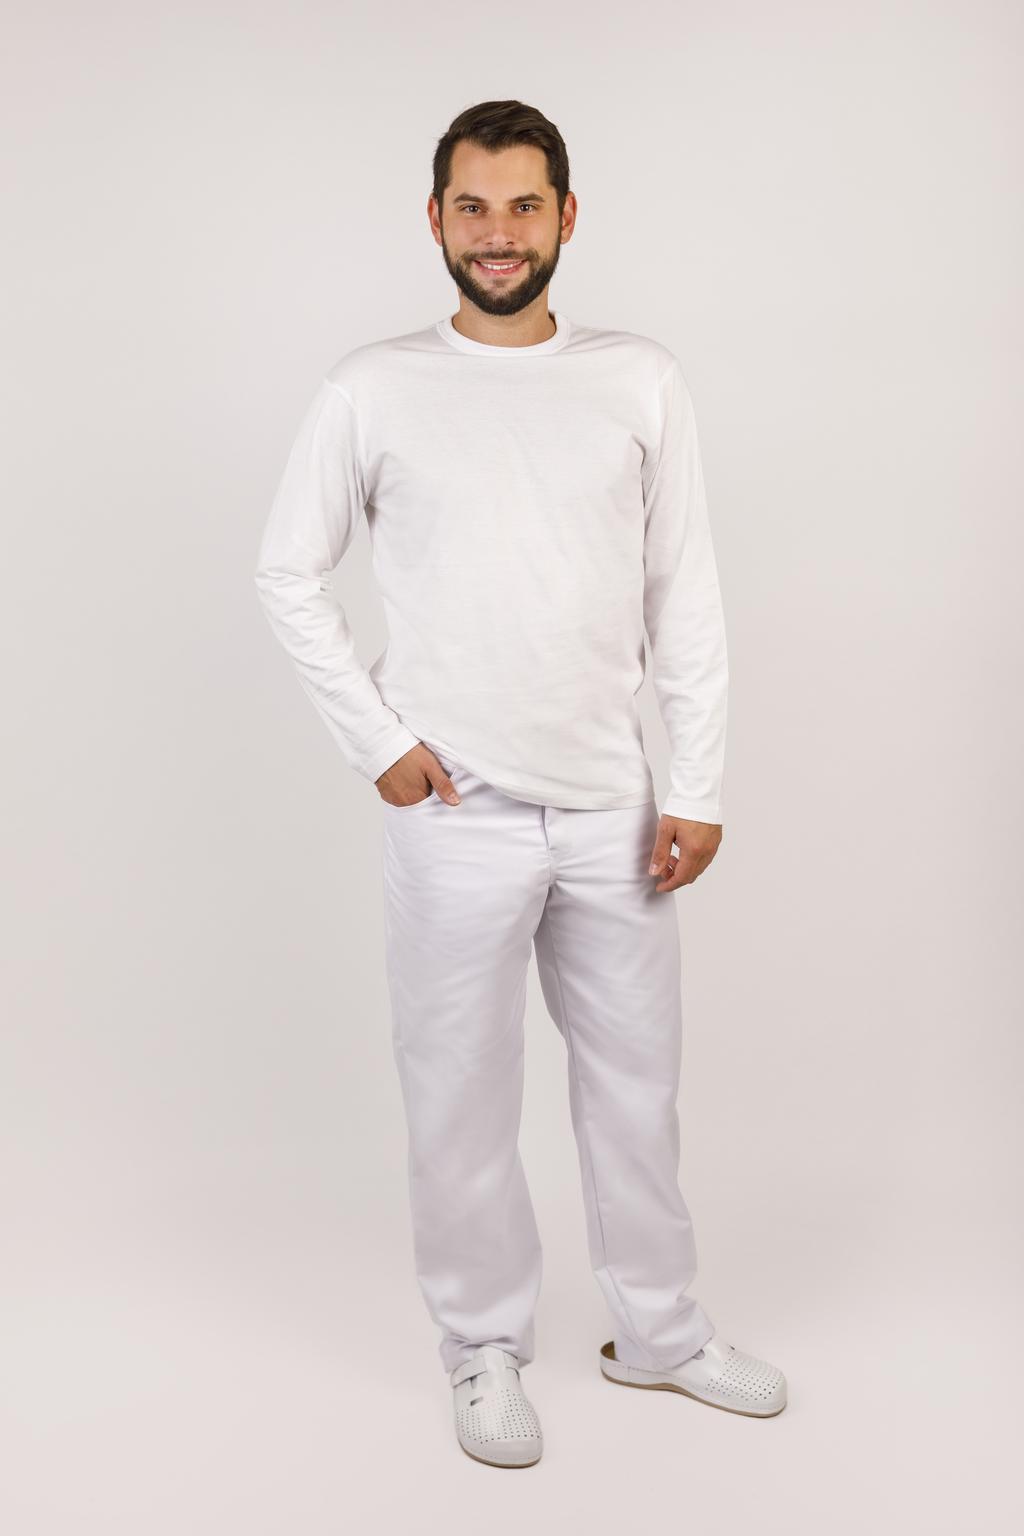 Pánské triko FILIP bavlněné triko s dlouhým rukávem